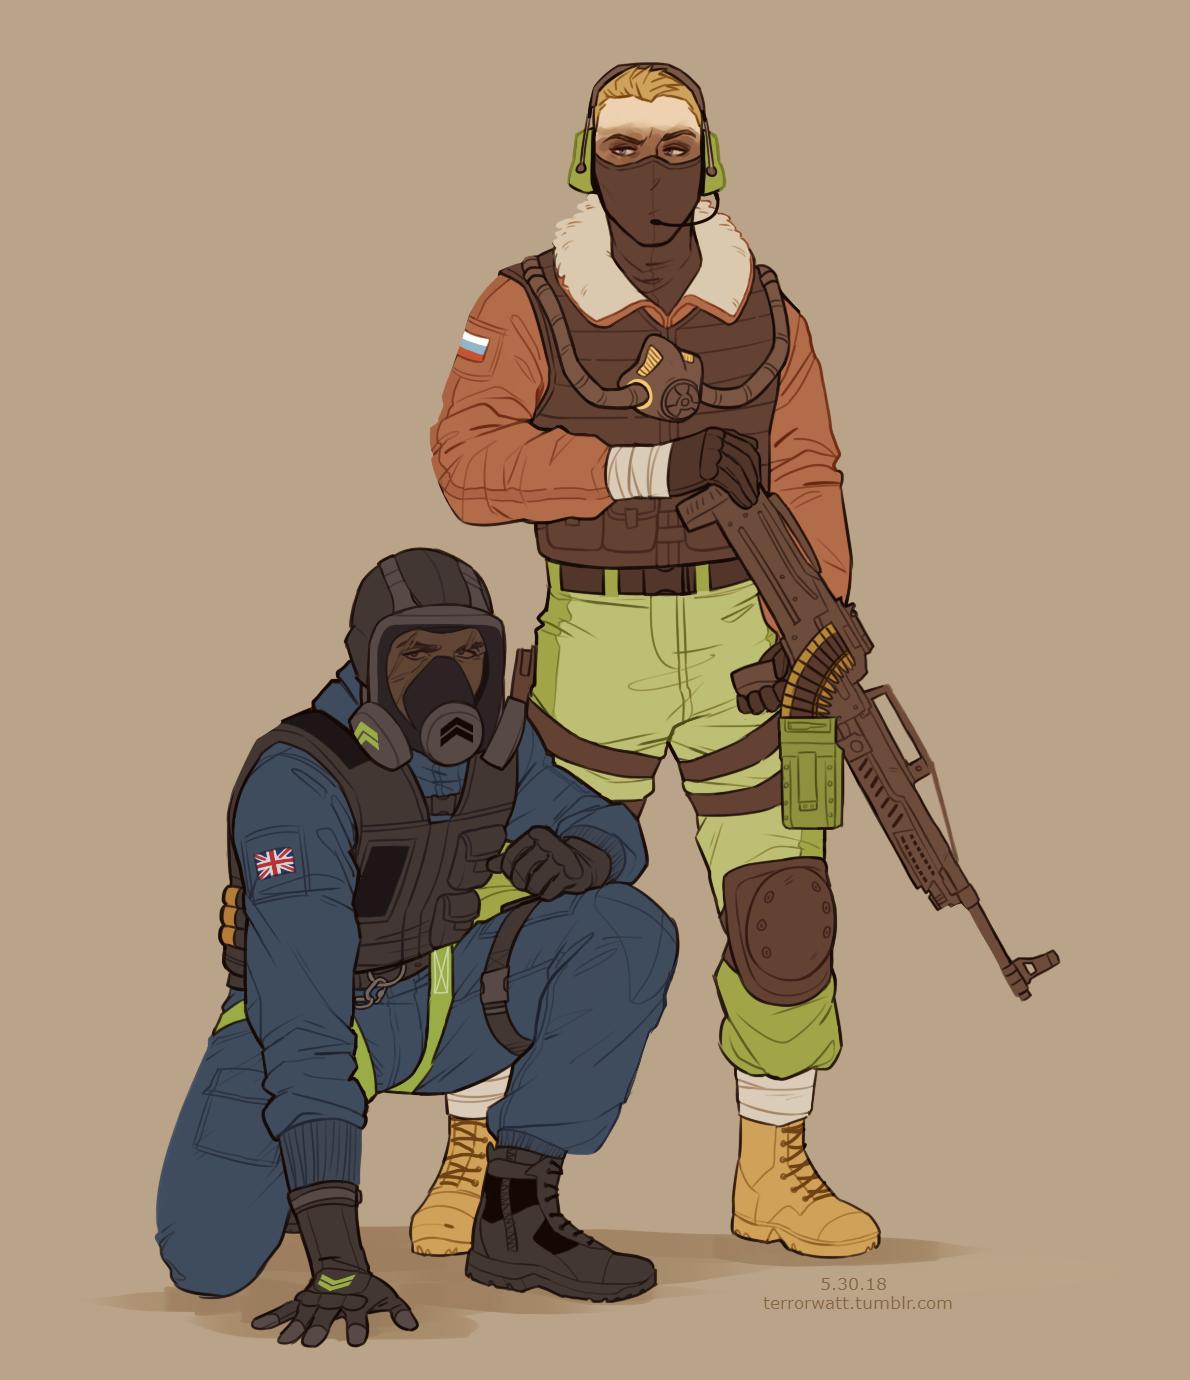 richter_and_krylo_by_terrorwatt-dcczxu8